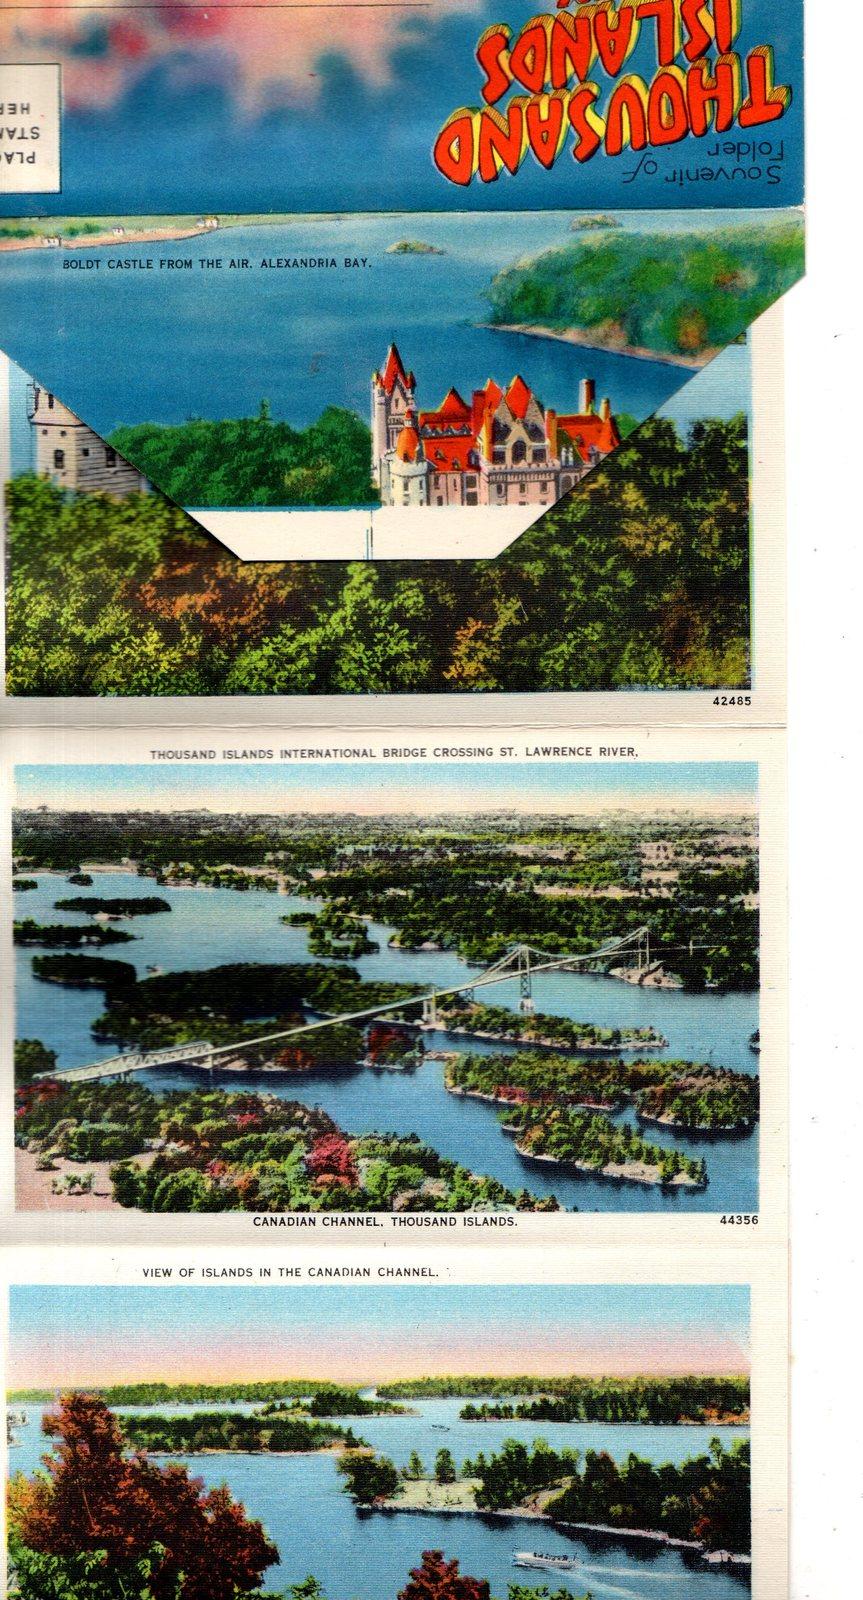 Thousand Islands Venice Of America Book & Souvenir Photo Booklet image 13